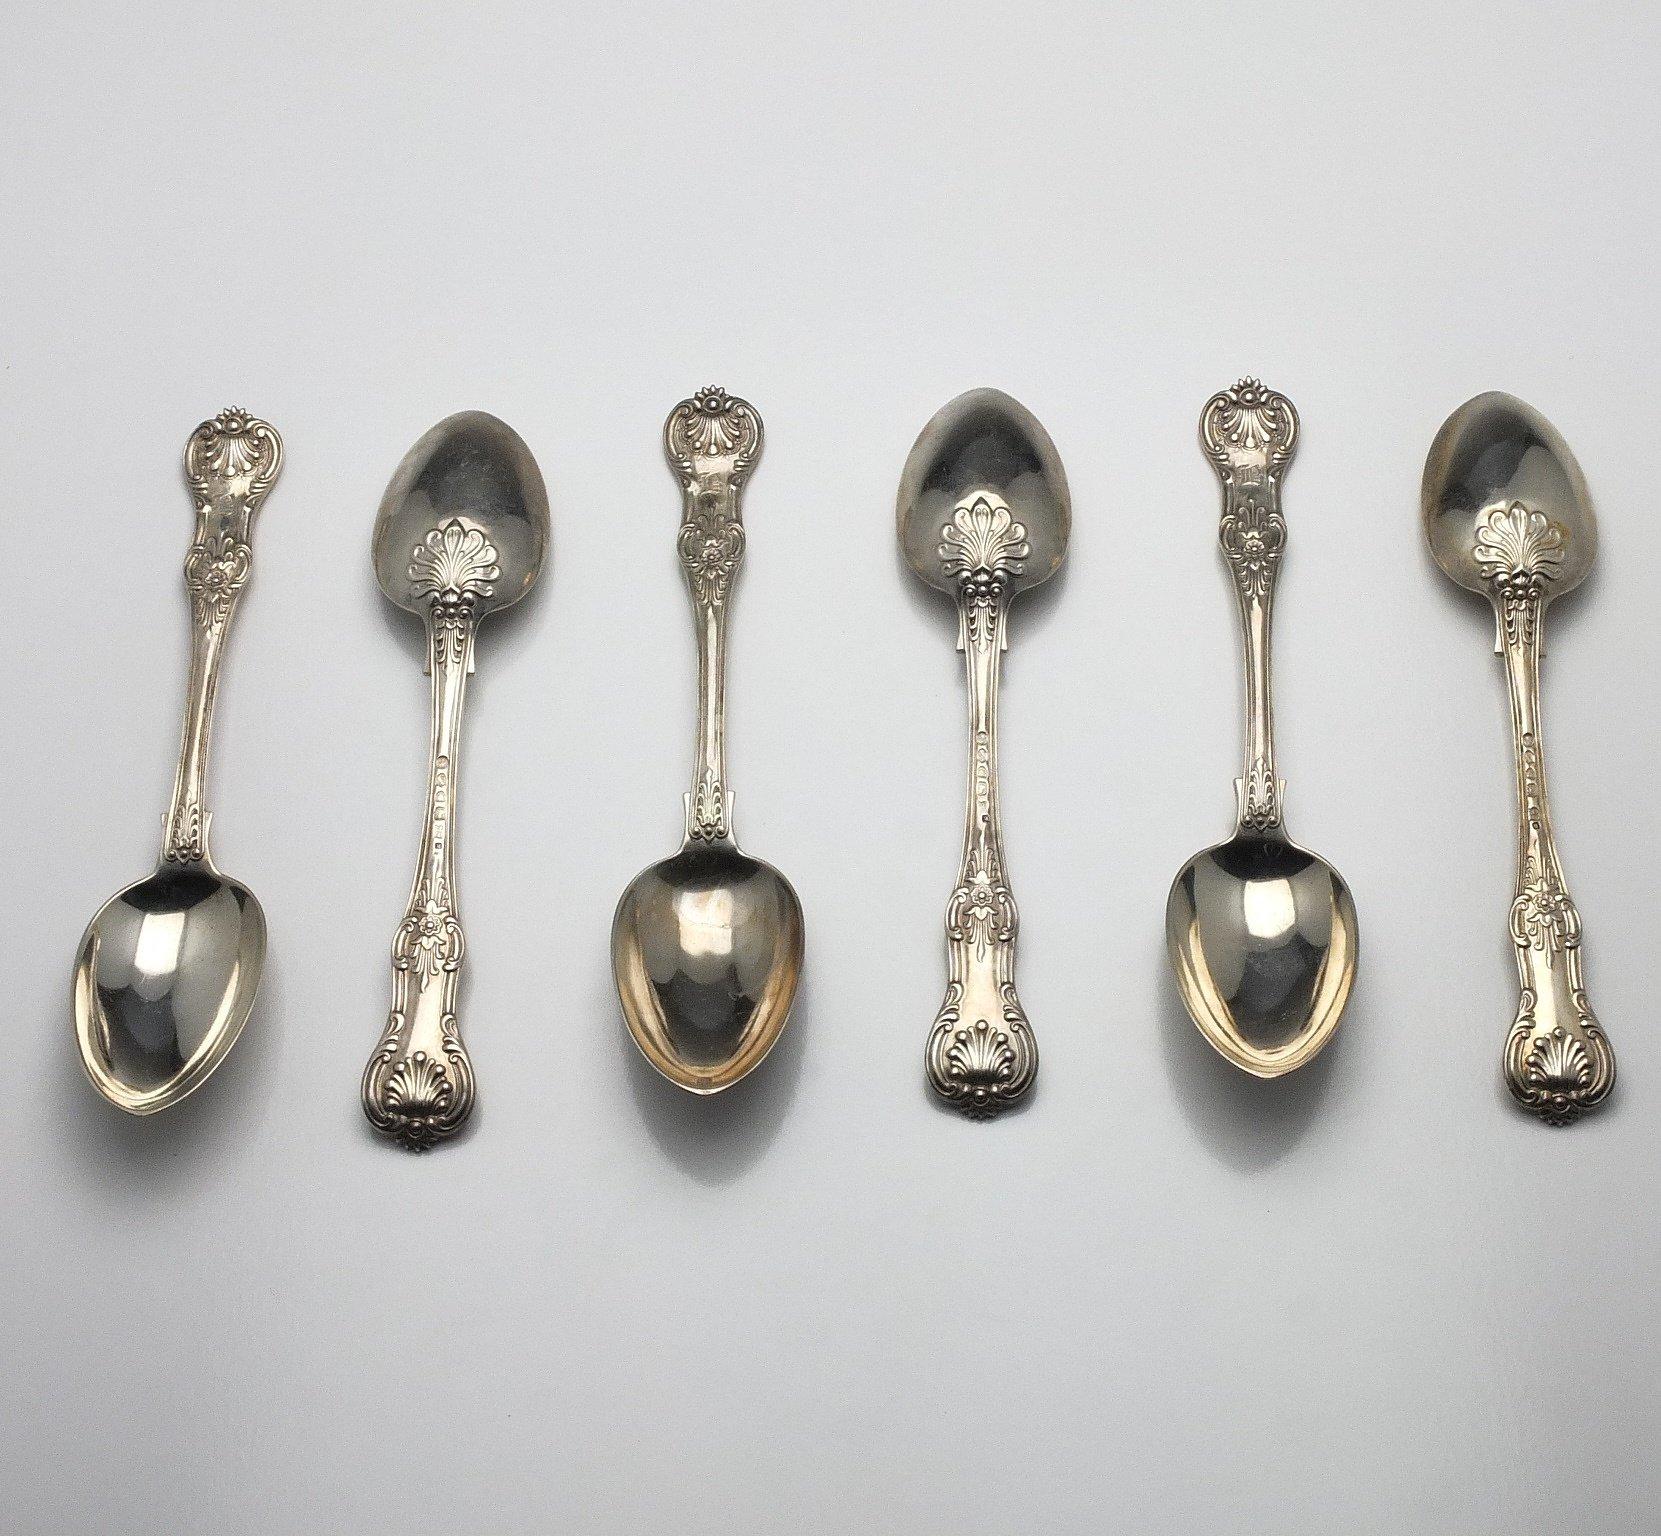 'Six Victorian Monogrammed Sterling Silver Kings Pattern Table Spoons John Aldwinckle & Thomas Slater London 1888'